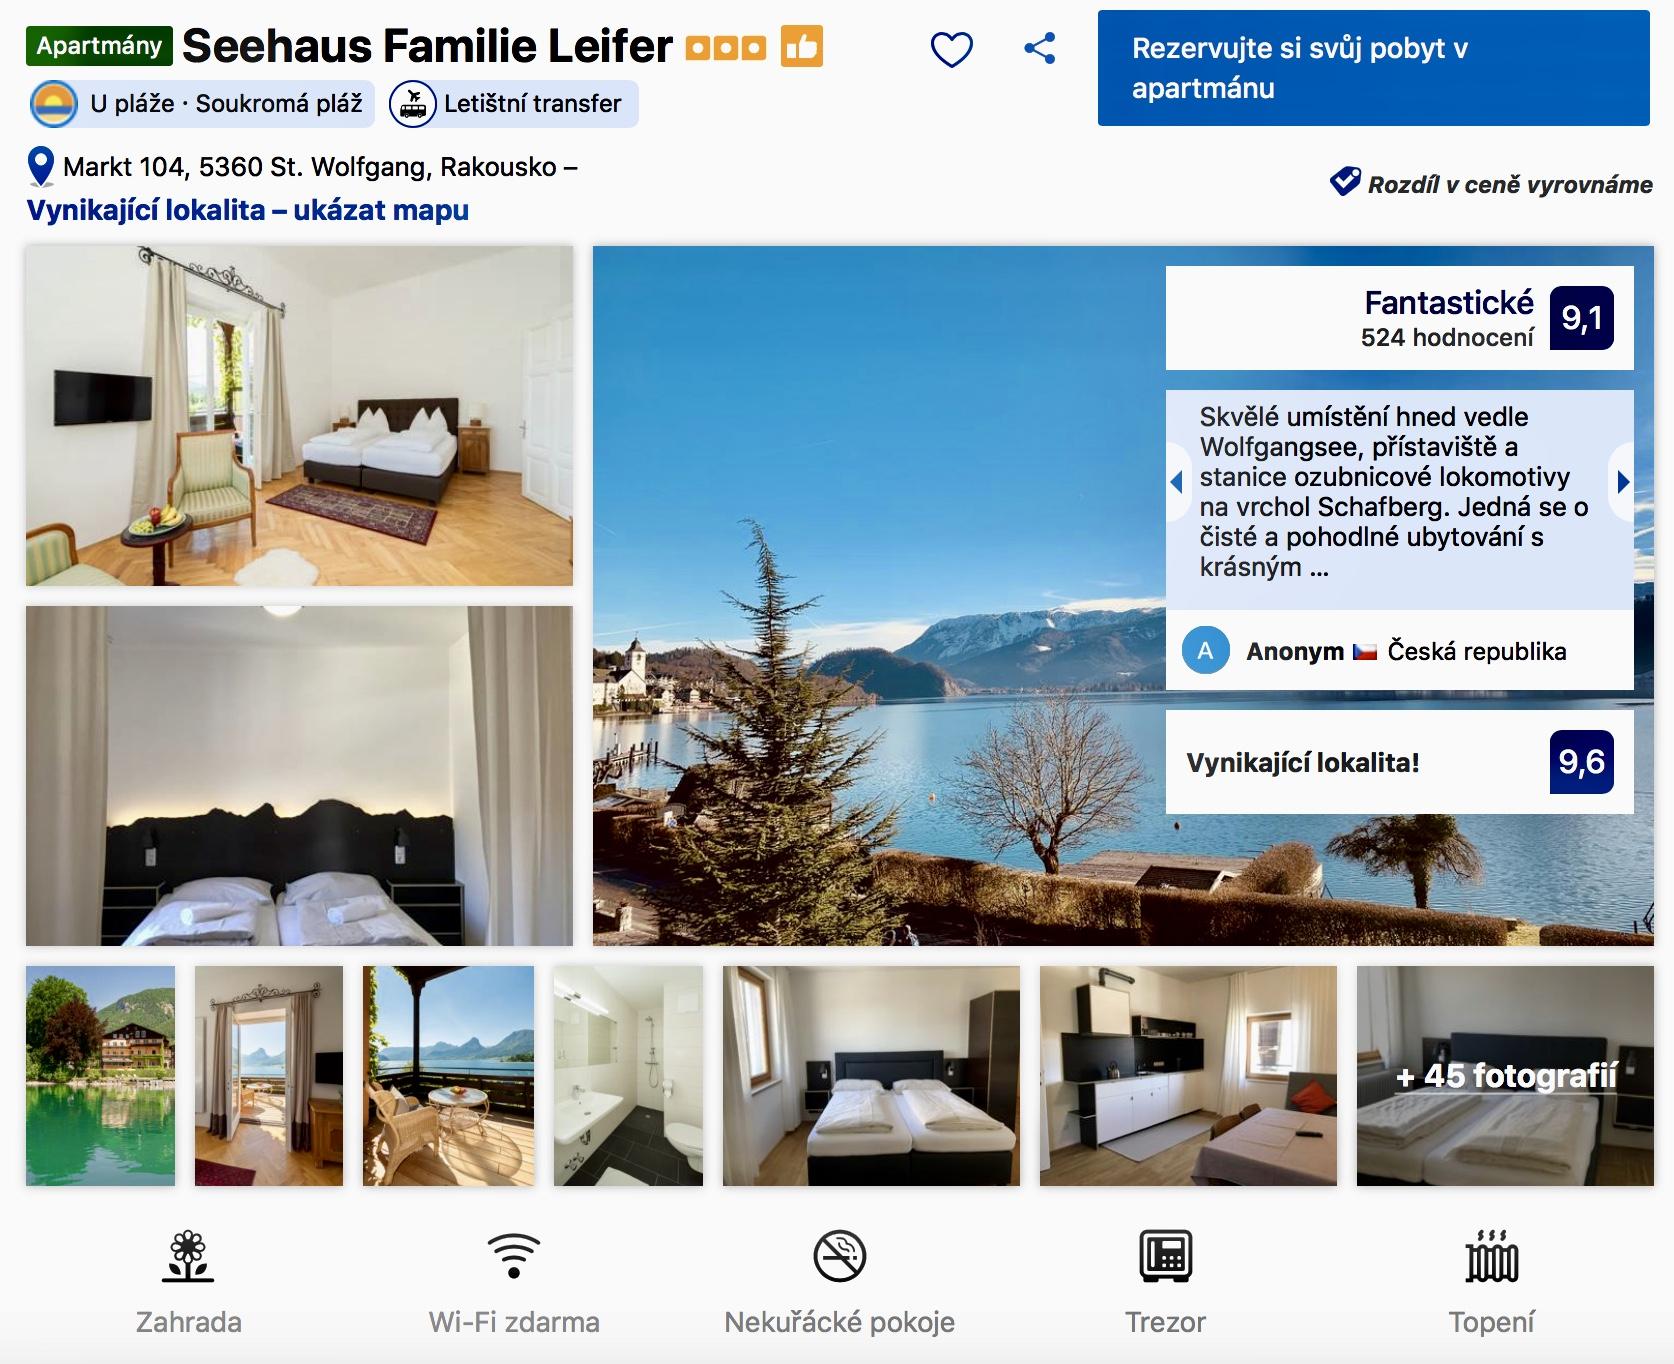 Seehaus Familie Leider